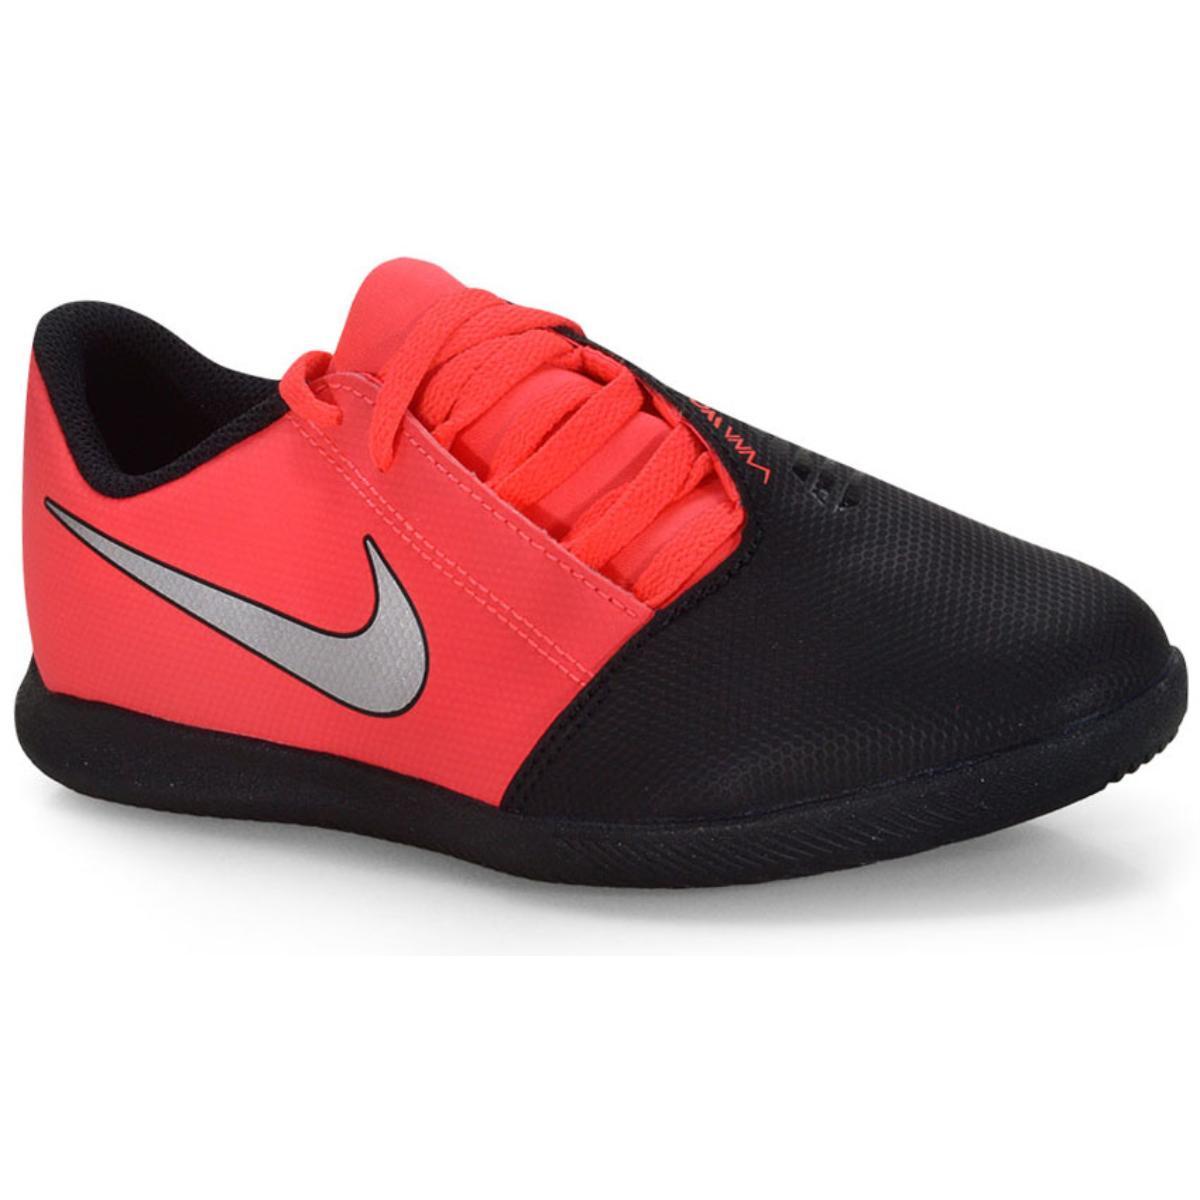 Tênis Masc Infantil Nike Ao0399-606 jr Phantom Venom Club ic Preto/vermelho